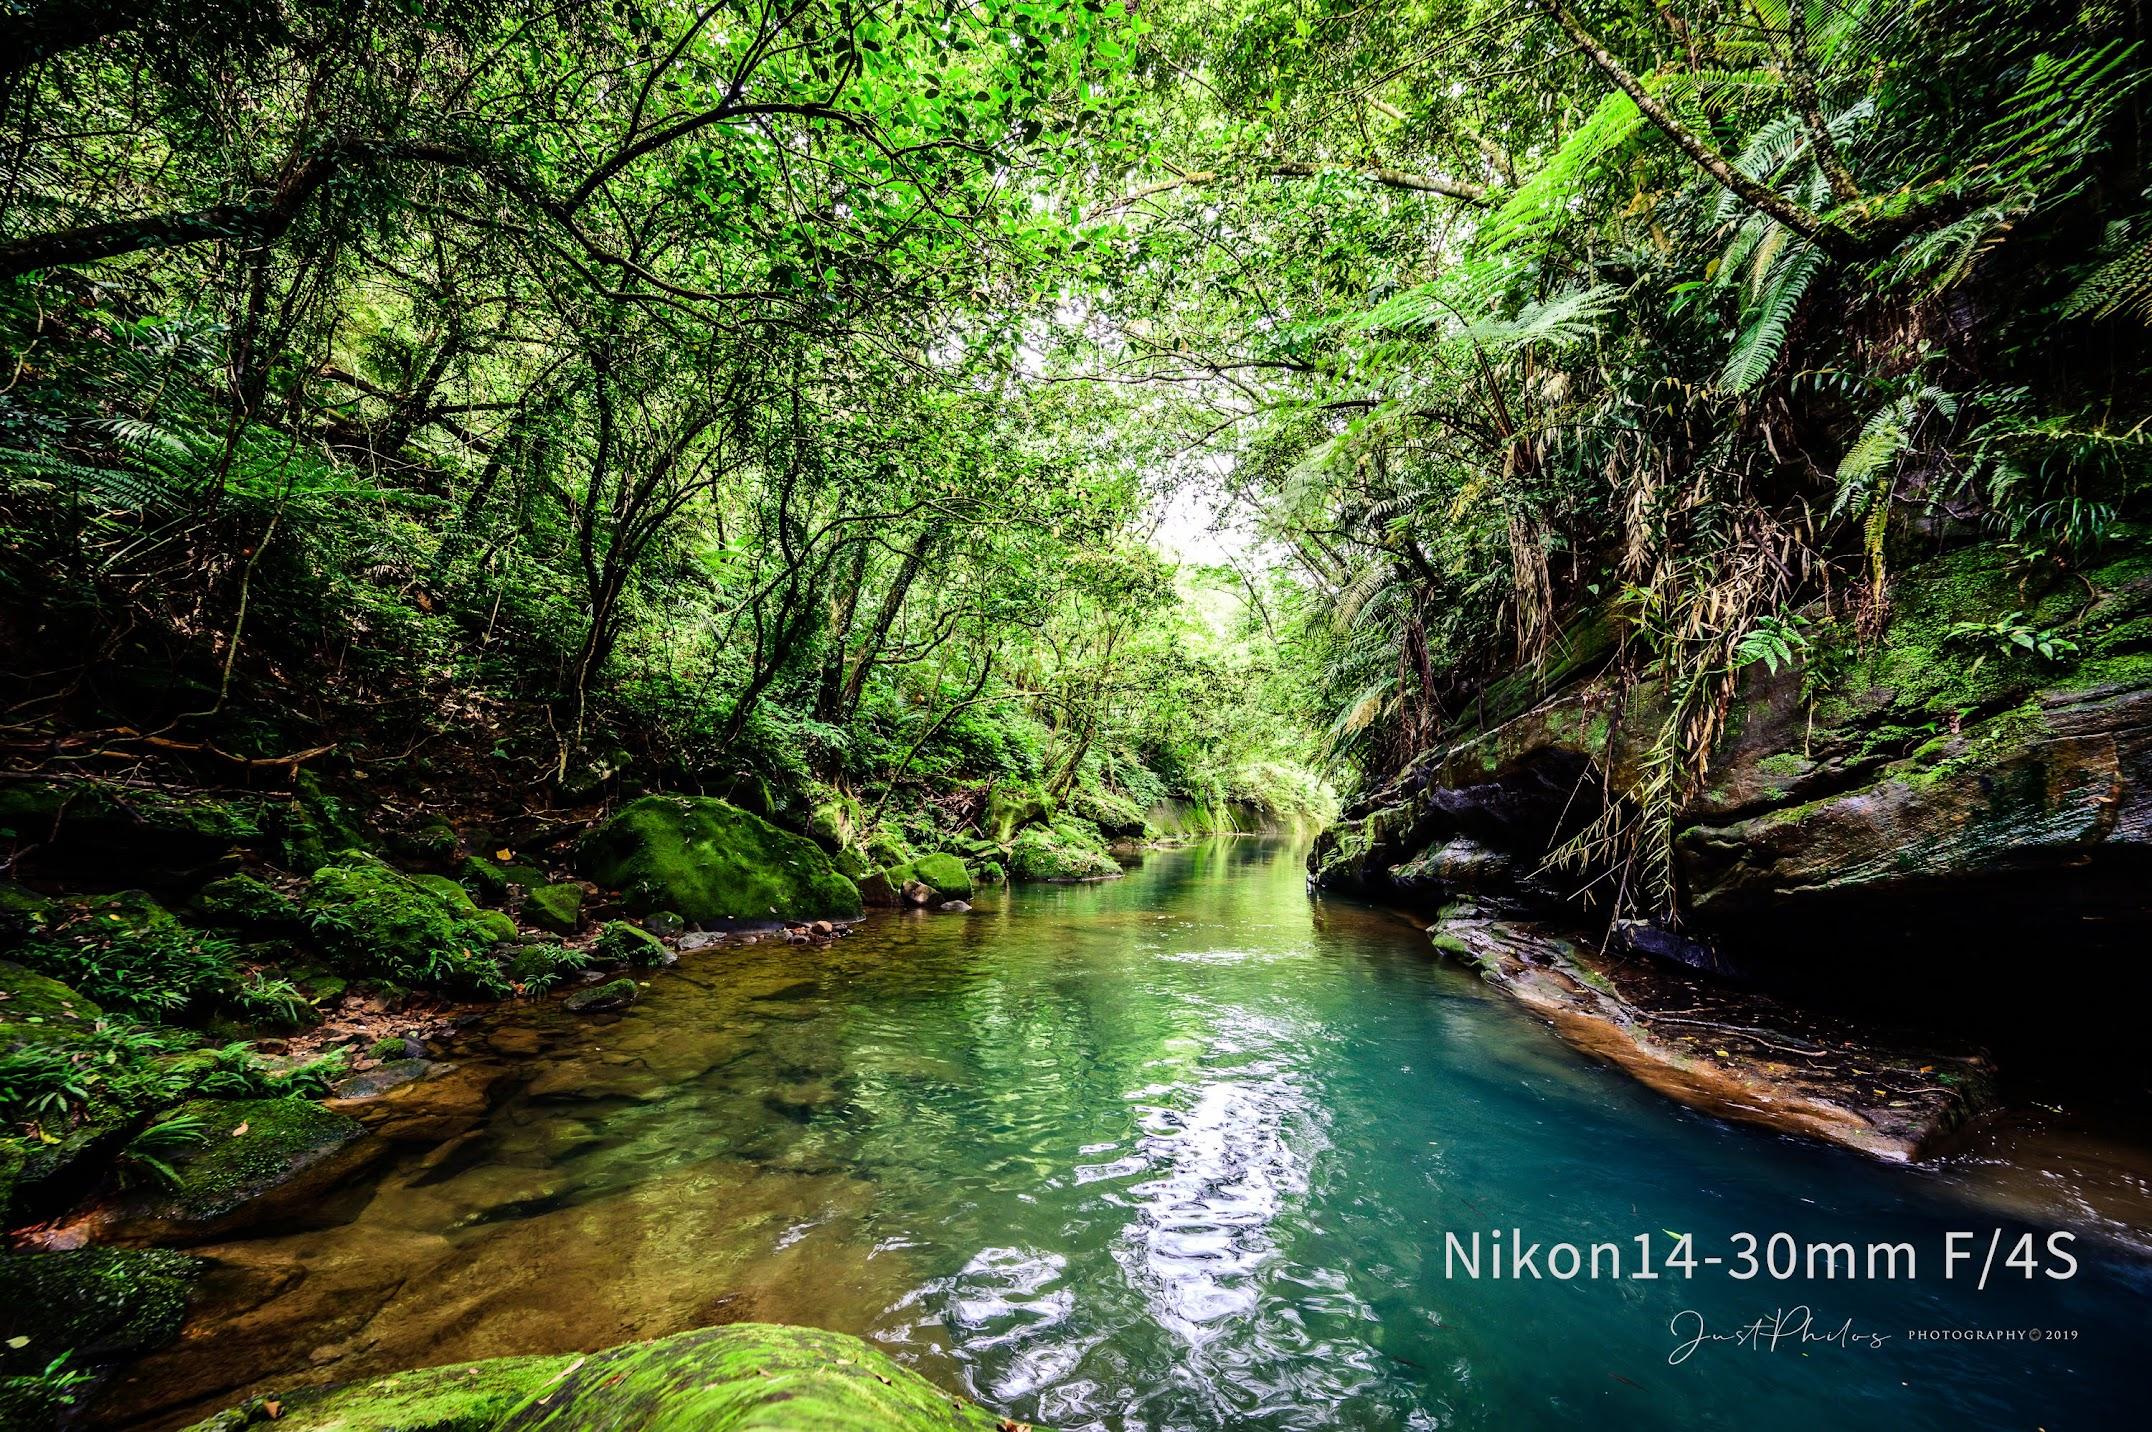 NIKON Z6+NIKON 14-30MM F/4S   f/5.6 1/15s ISO200 瑪陵坑溪亞馬遜秘境。